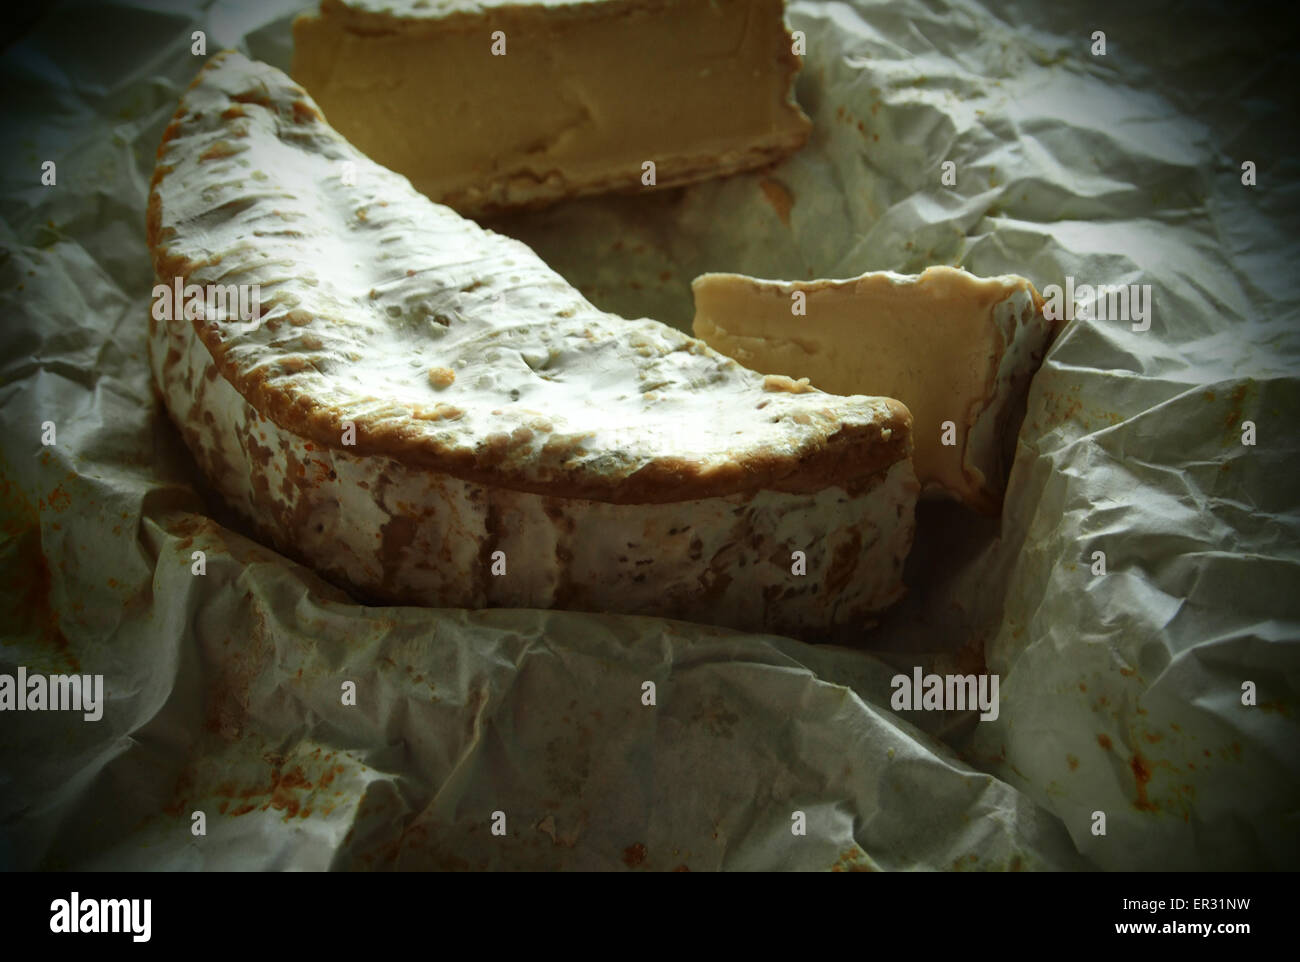 Camembert on crumpled wrapping paper. Grunge style. 26th May, 2015. © Igor Golovniov/ZUMA Wire/ZUMAPRESS.com/Alamy - Stock Image